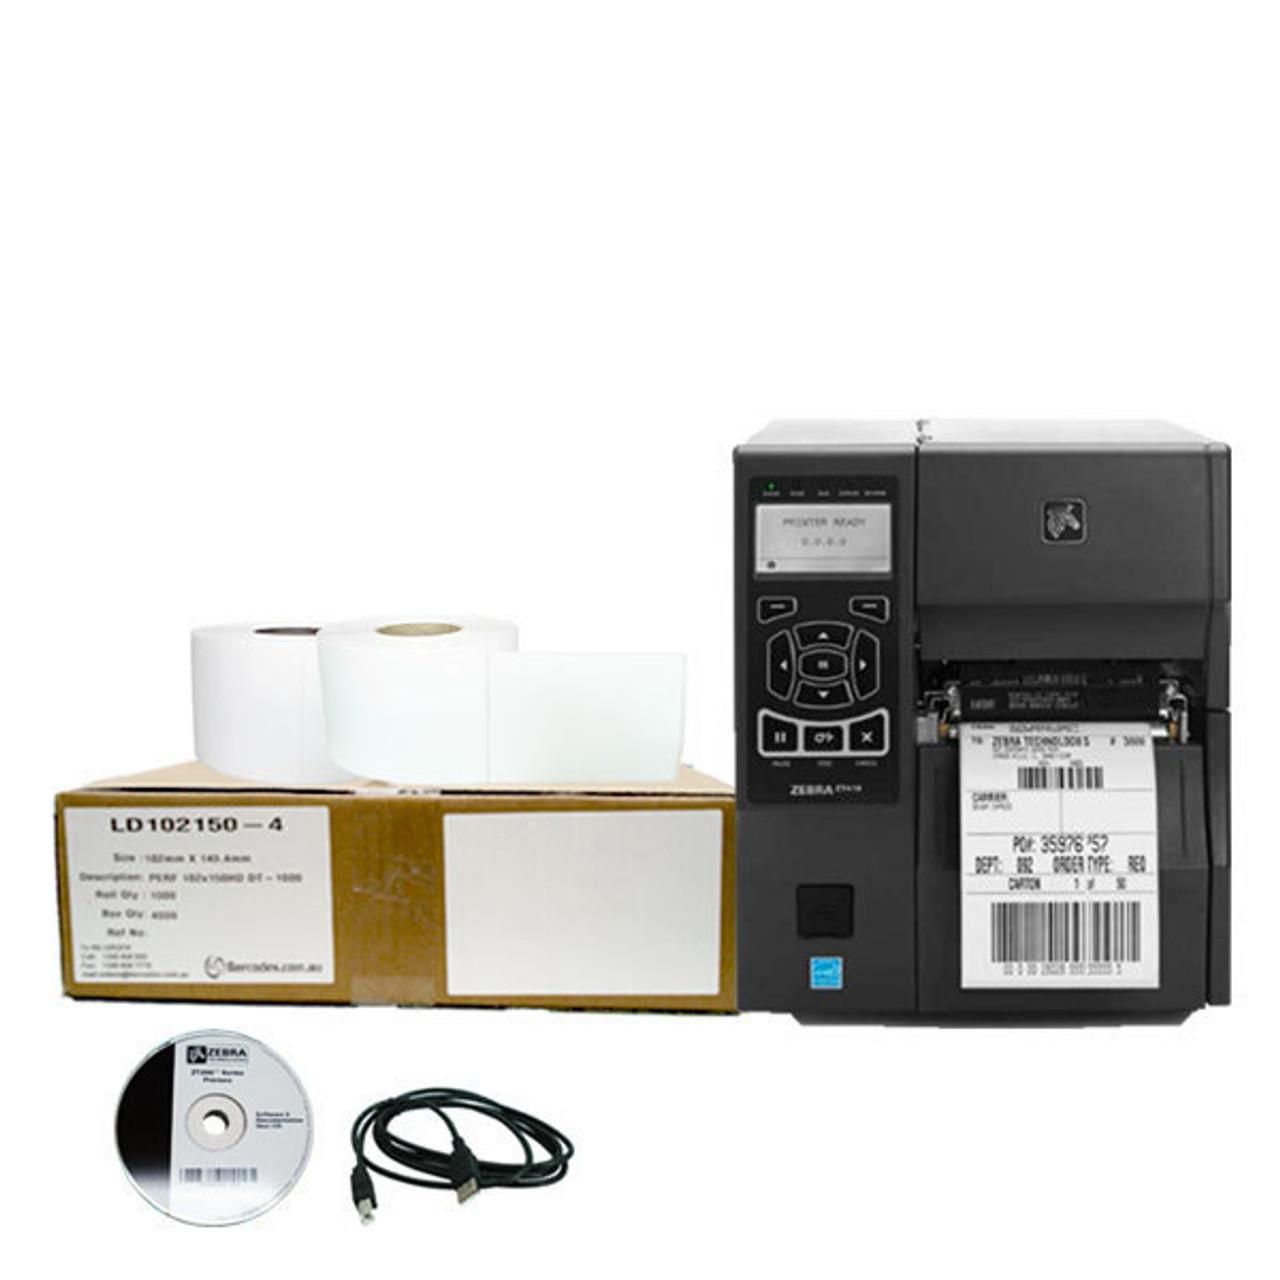 Shipping Label Printer Package Zebra ZT410 Printer